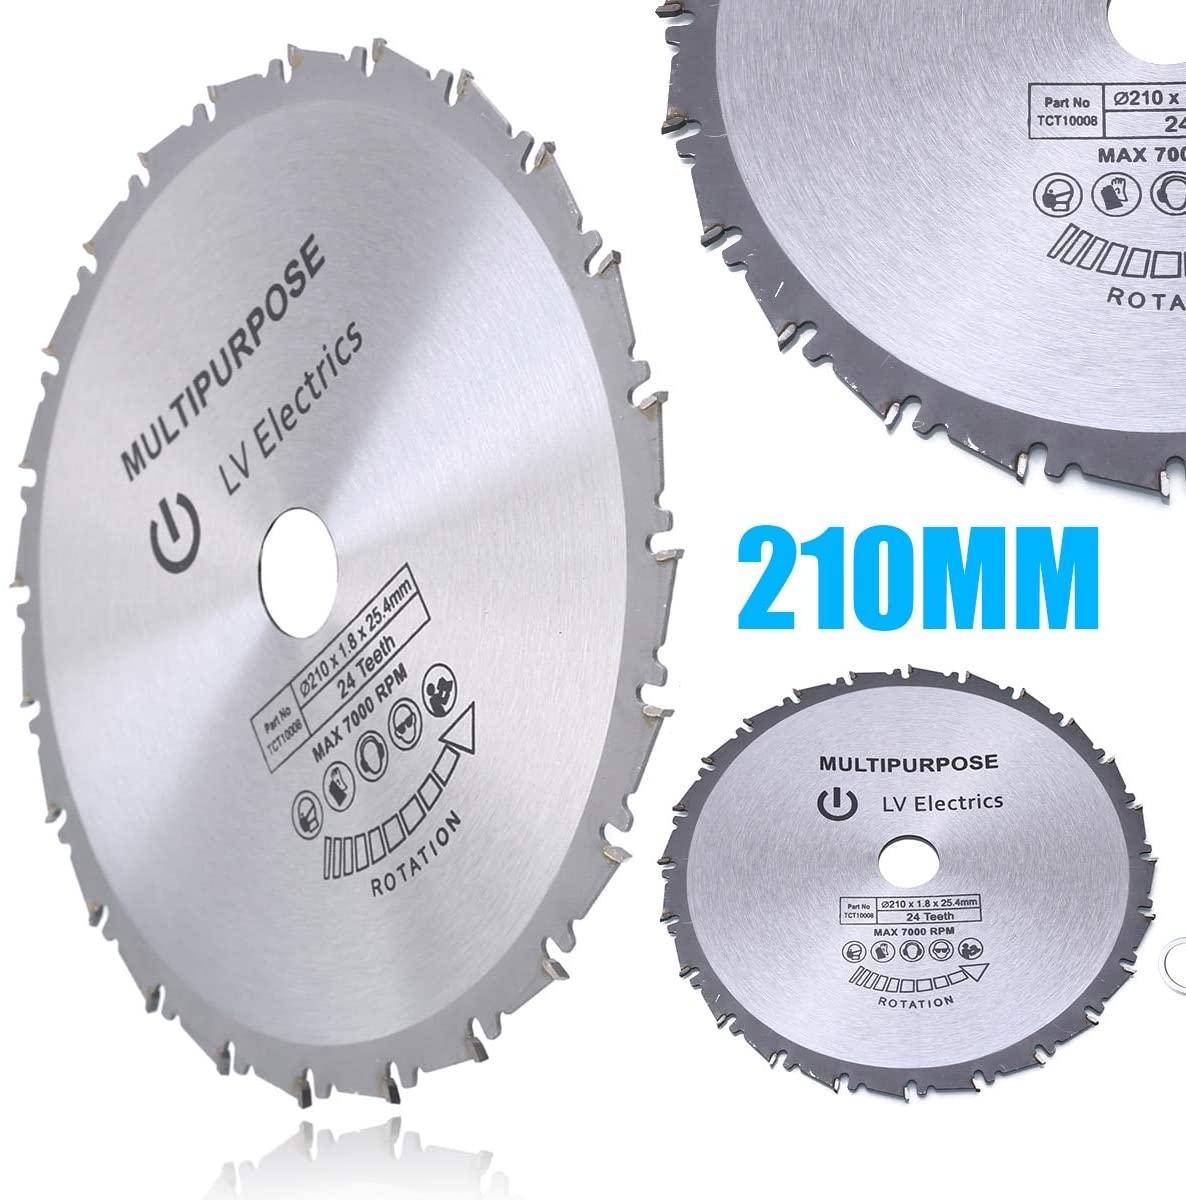 Pumbaa High Hardness 210mm Circular Saw Blade Disc Wood Plastic Circular Metal Saw Blade For Rage Rage4 RageB 25.4mm Bore Evolution 24T